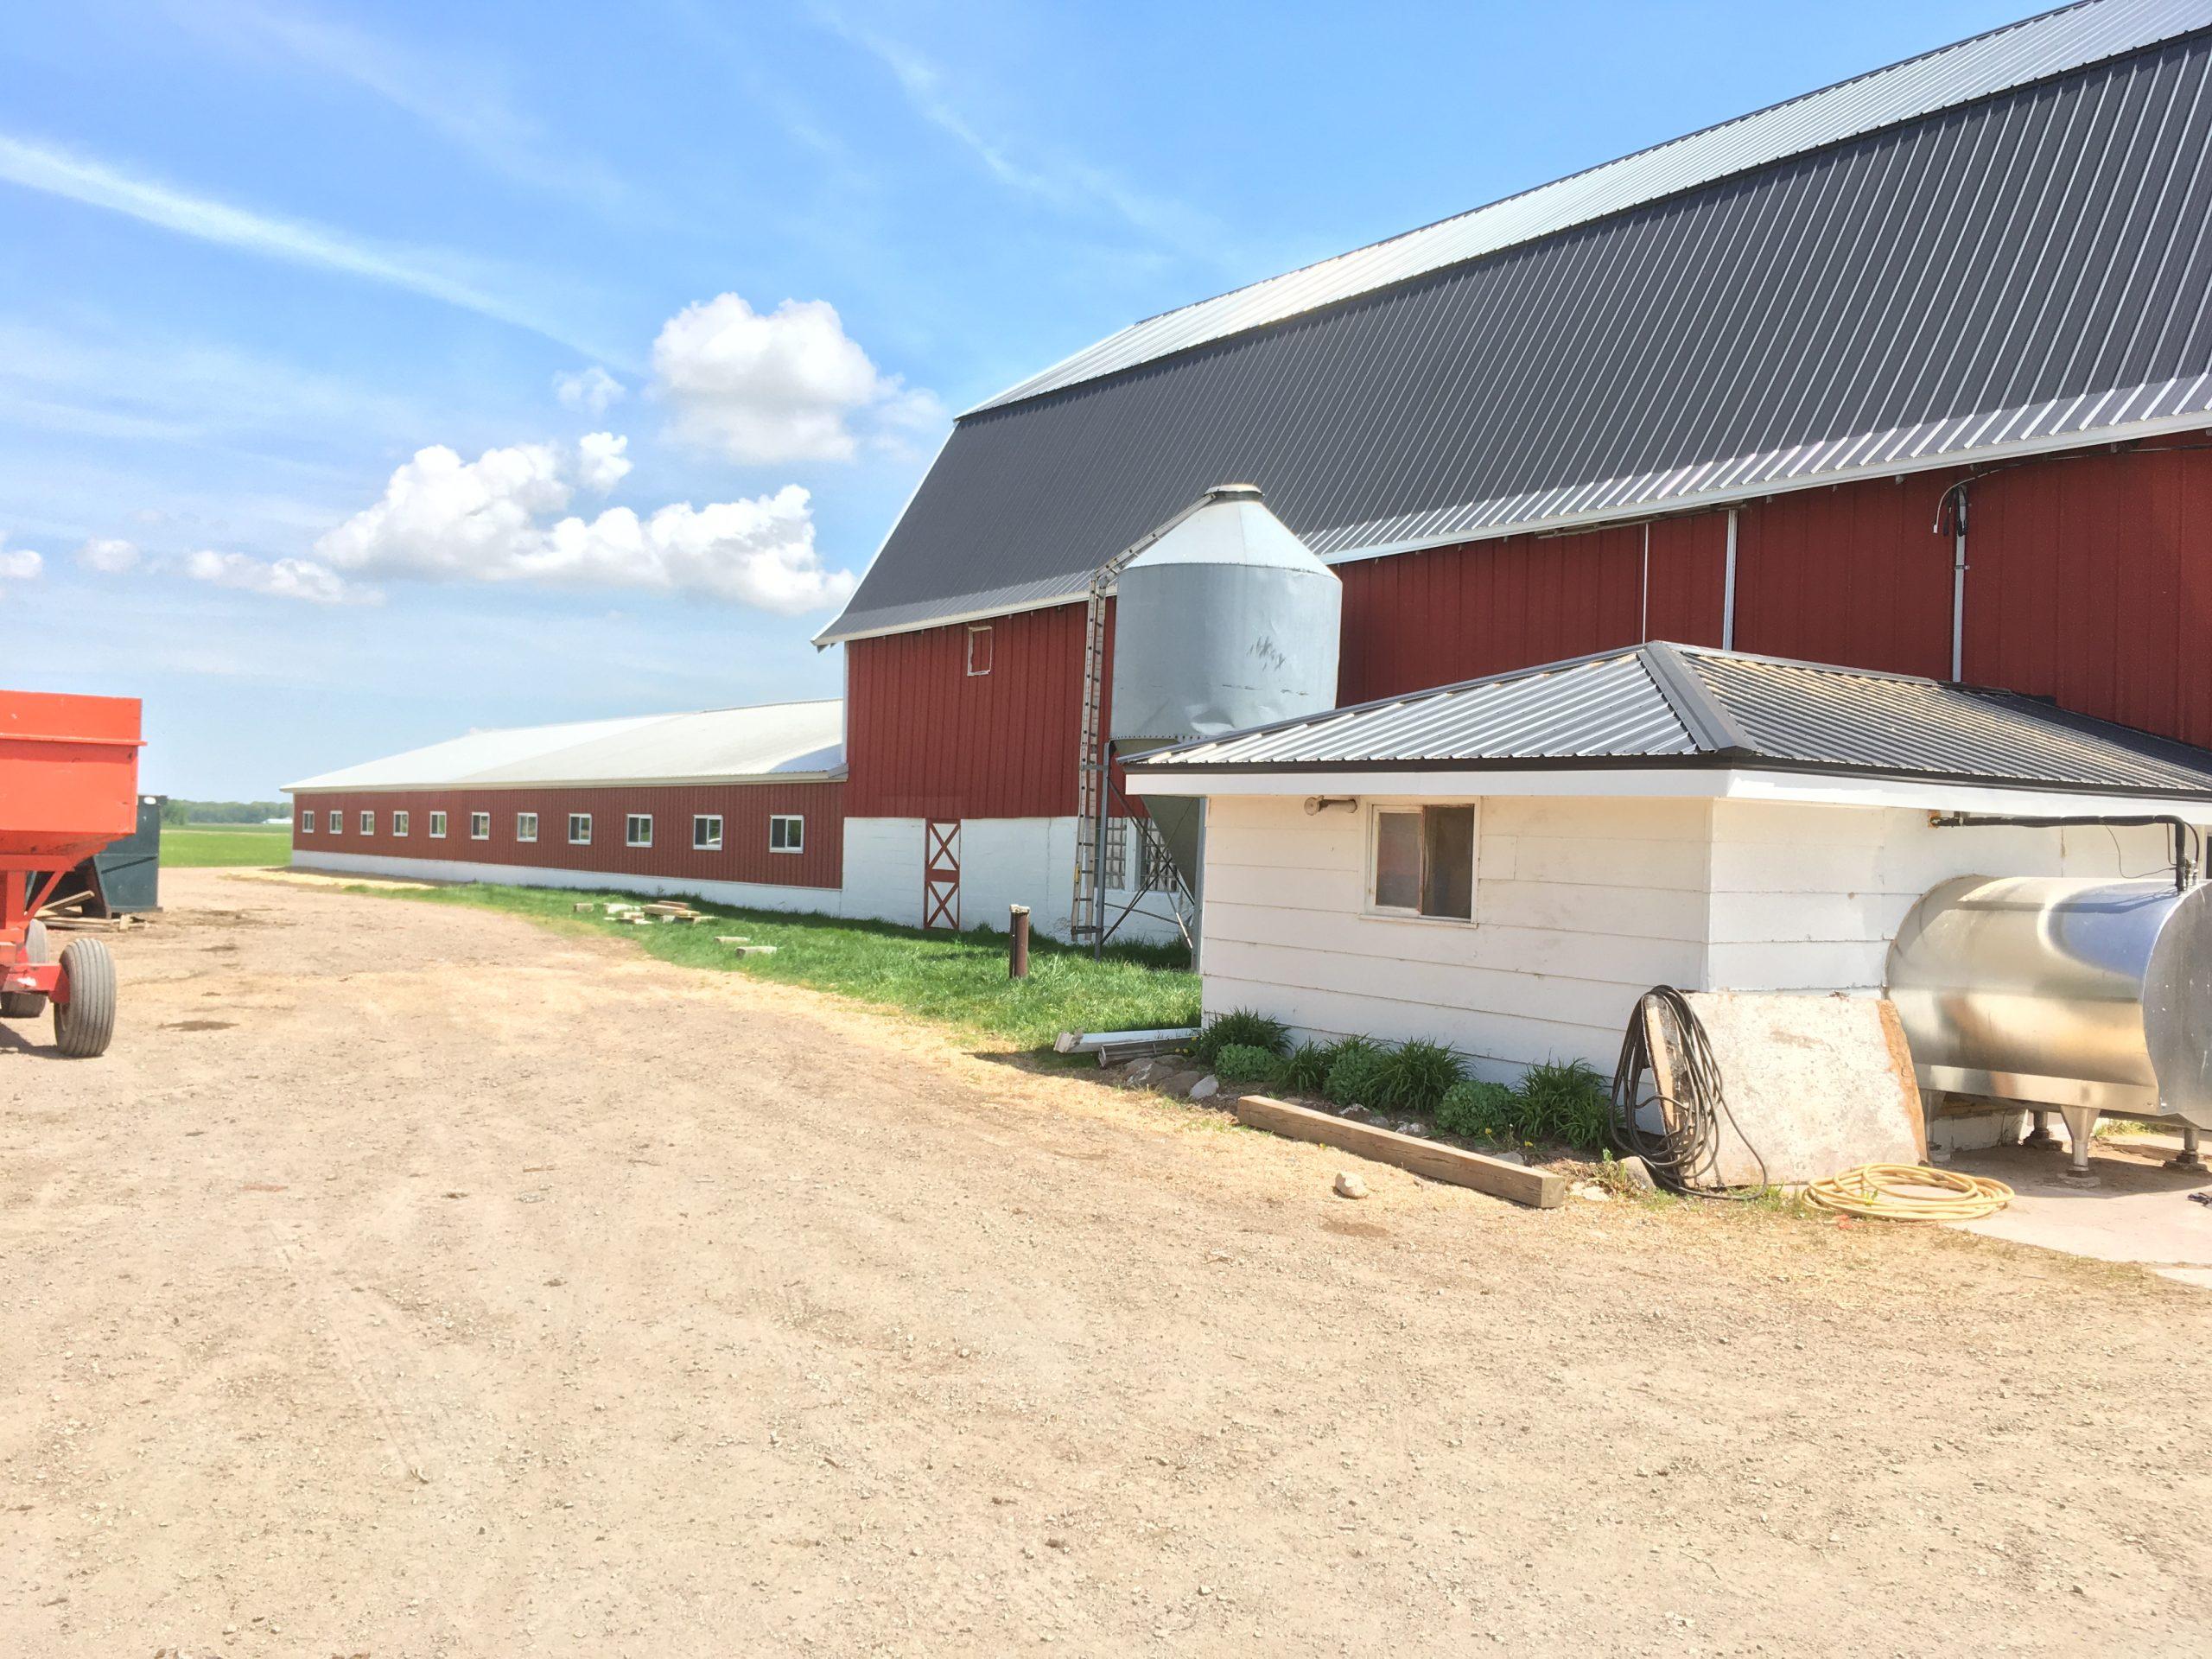 Van Handel Farm